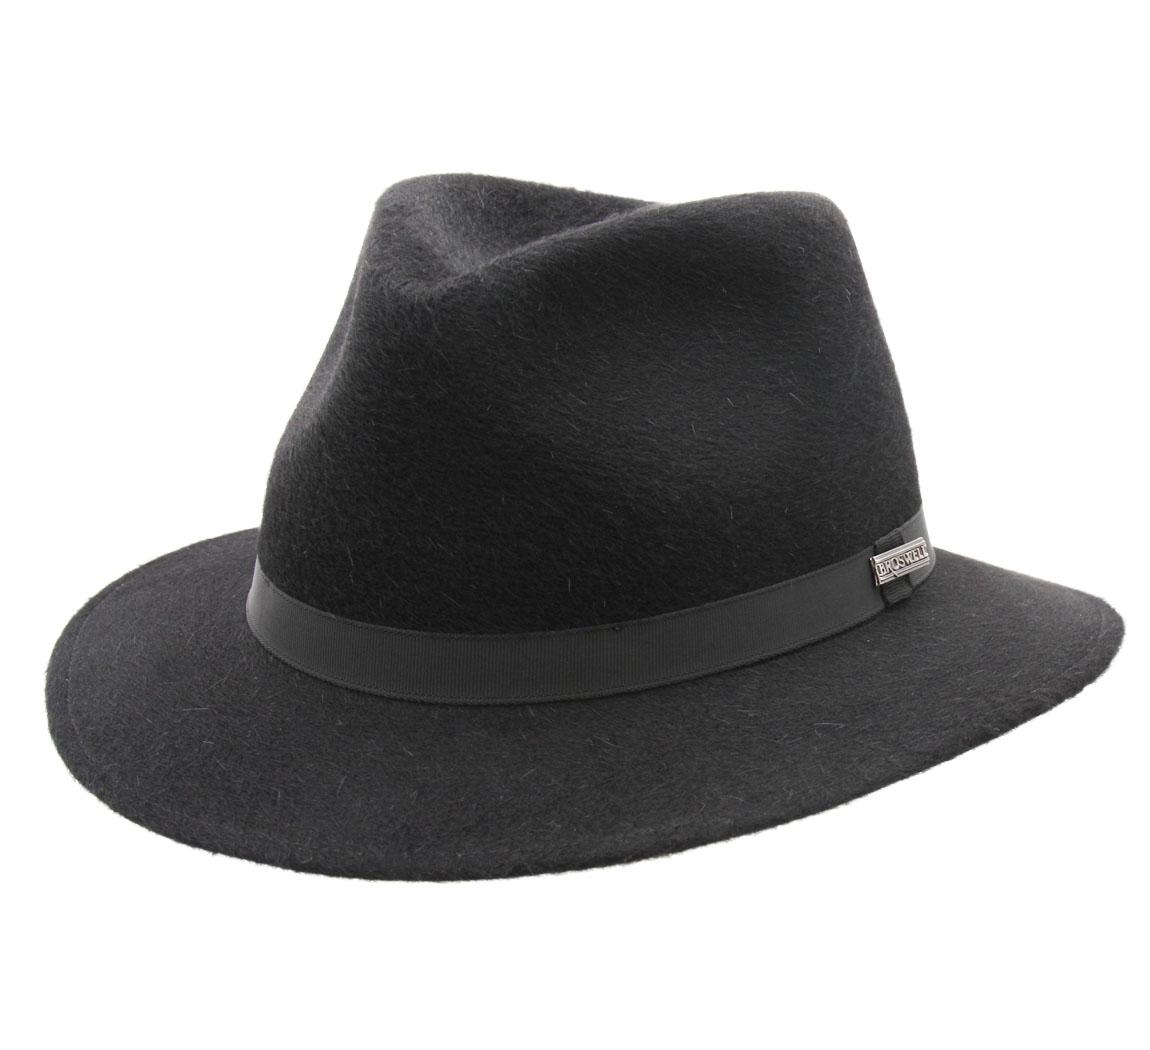 d607f51a62c Hamilton Cachemire - Hats Crambes